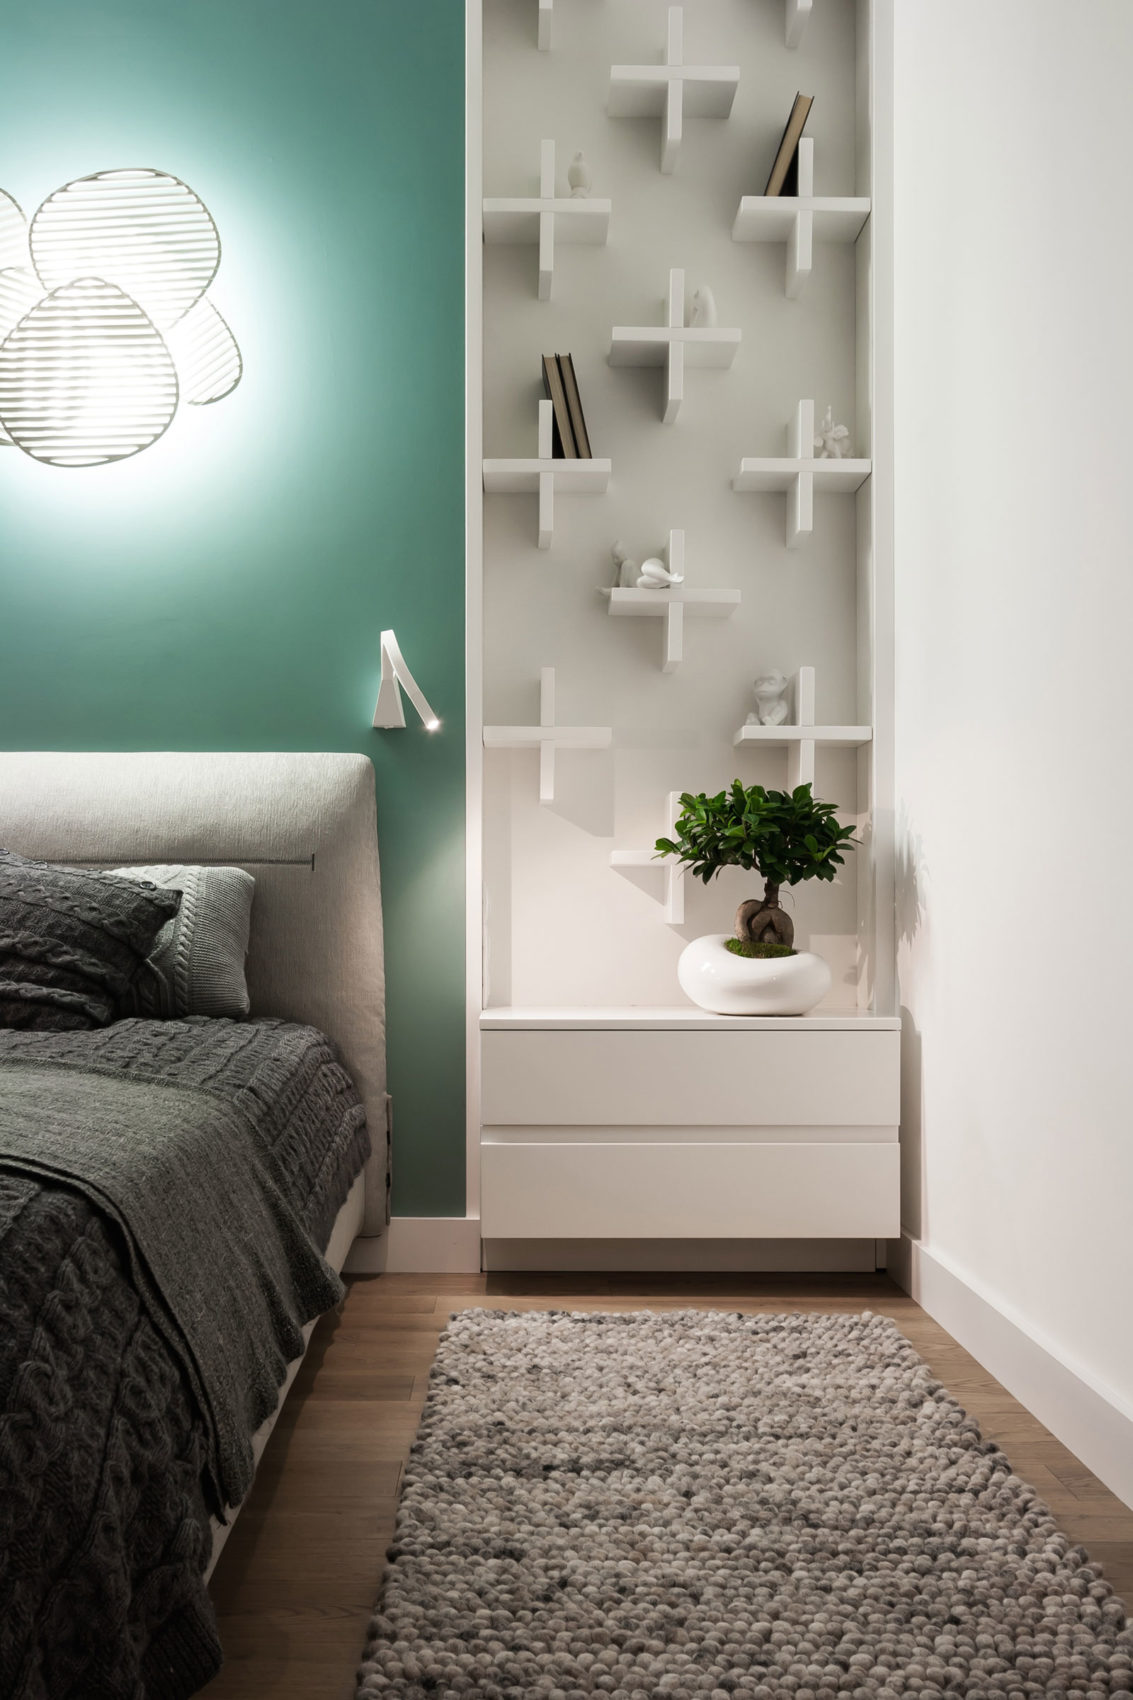 Apartment in Ukraine by SVOYA Studio (17)